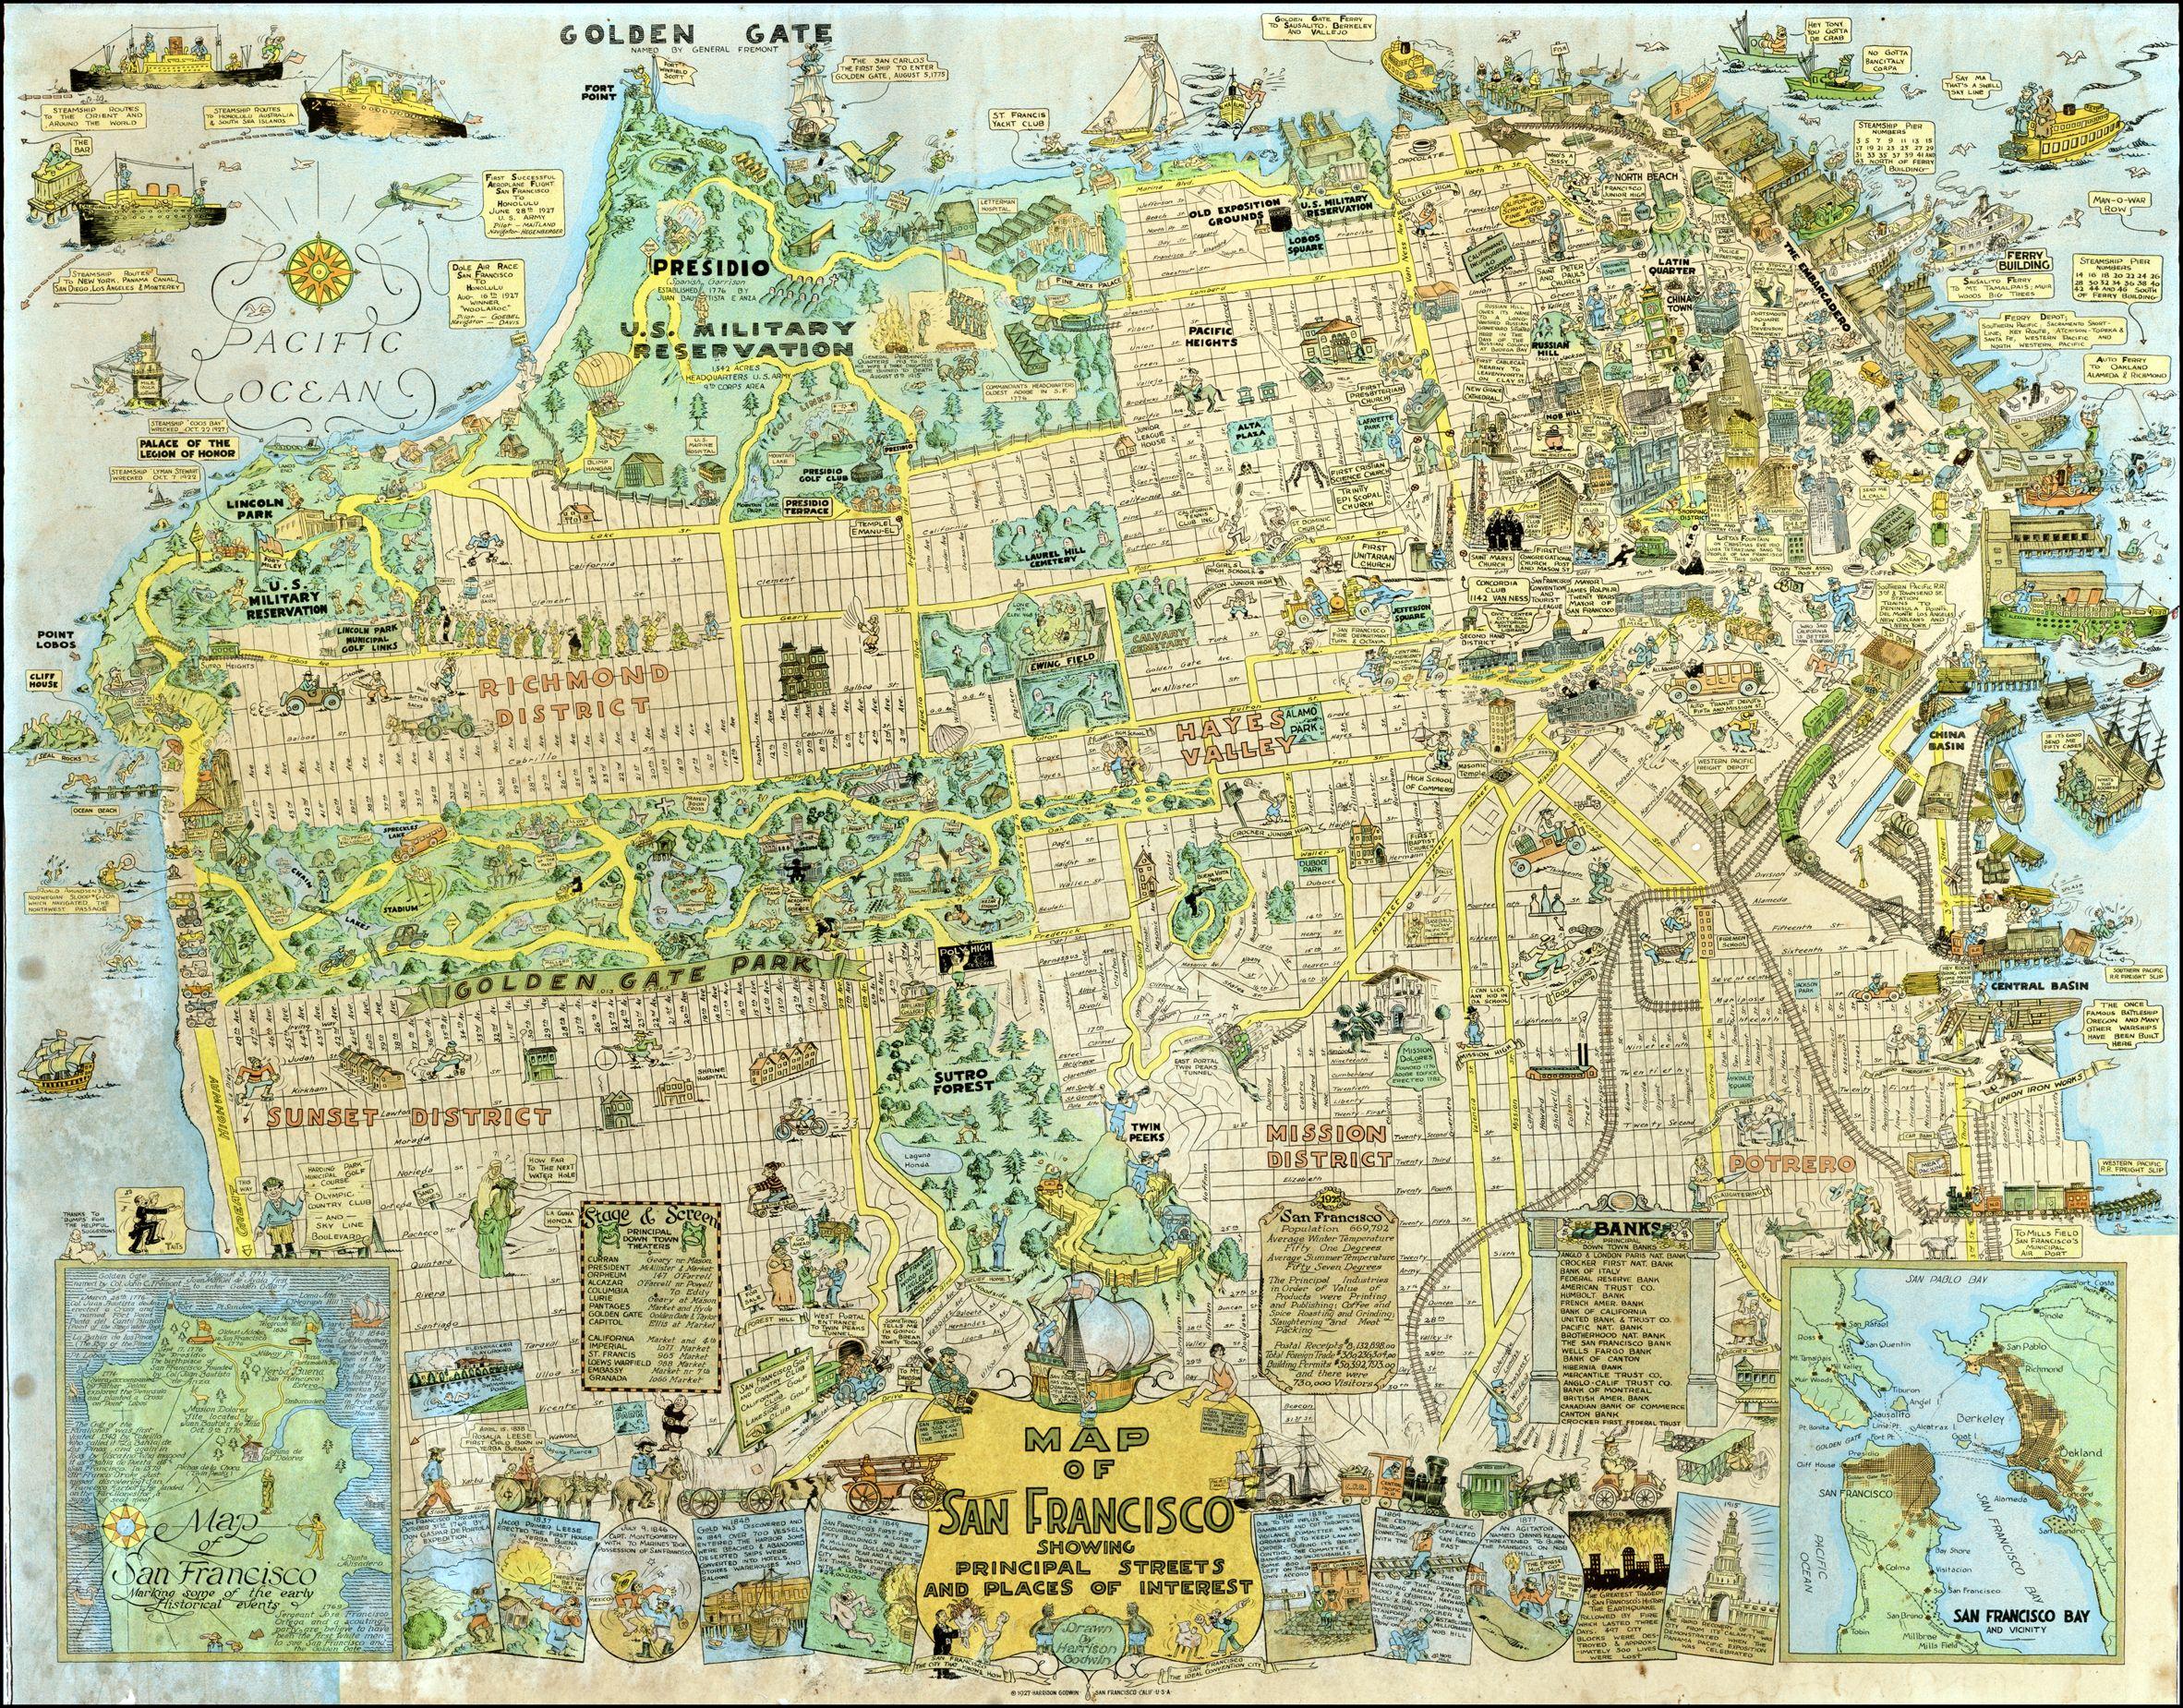 1927 tourist map of San Francisco maps Pinterest Tourist map